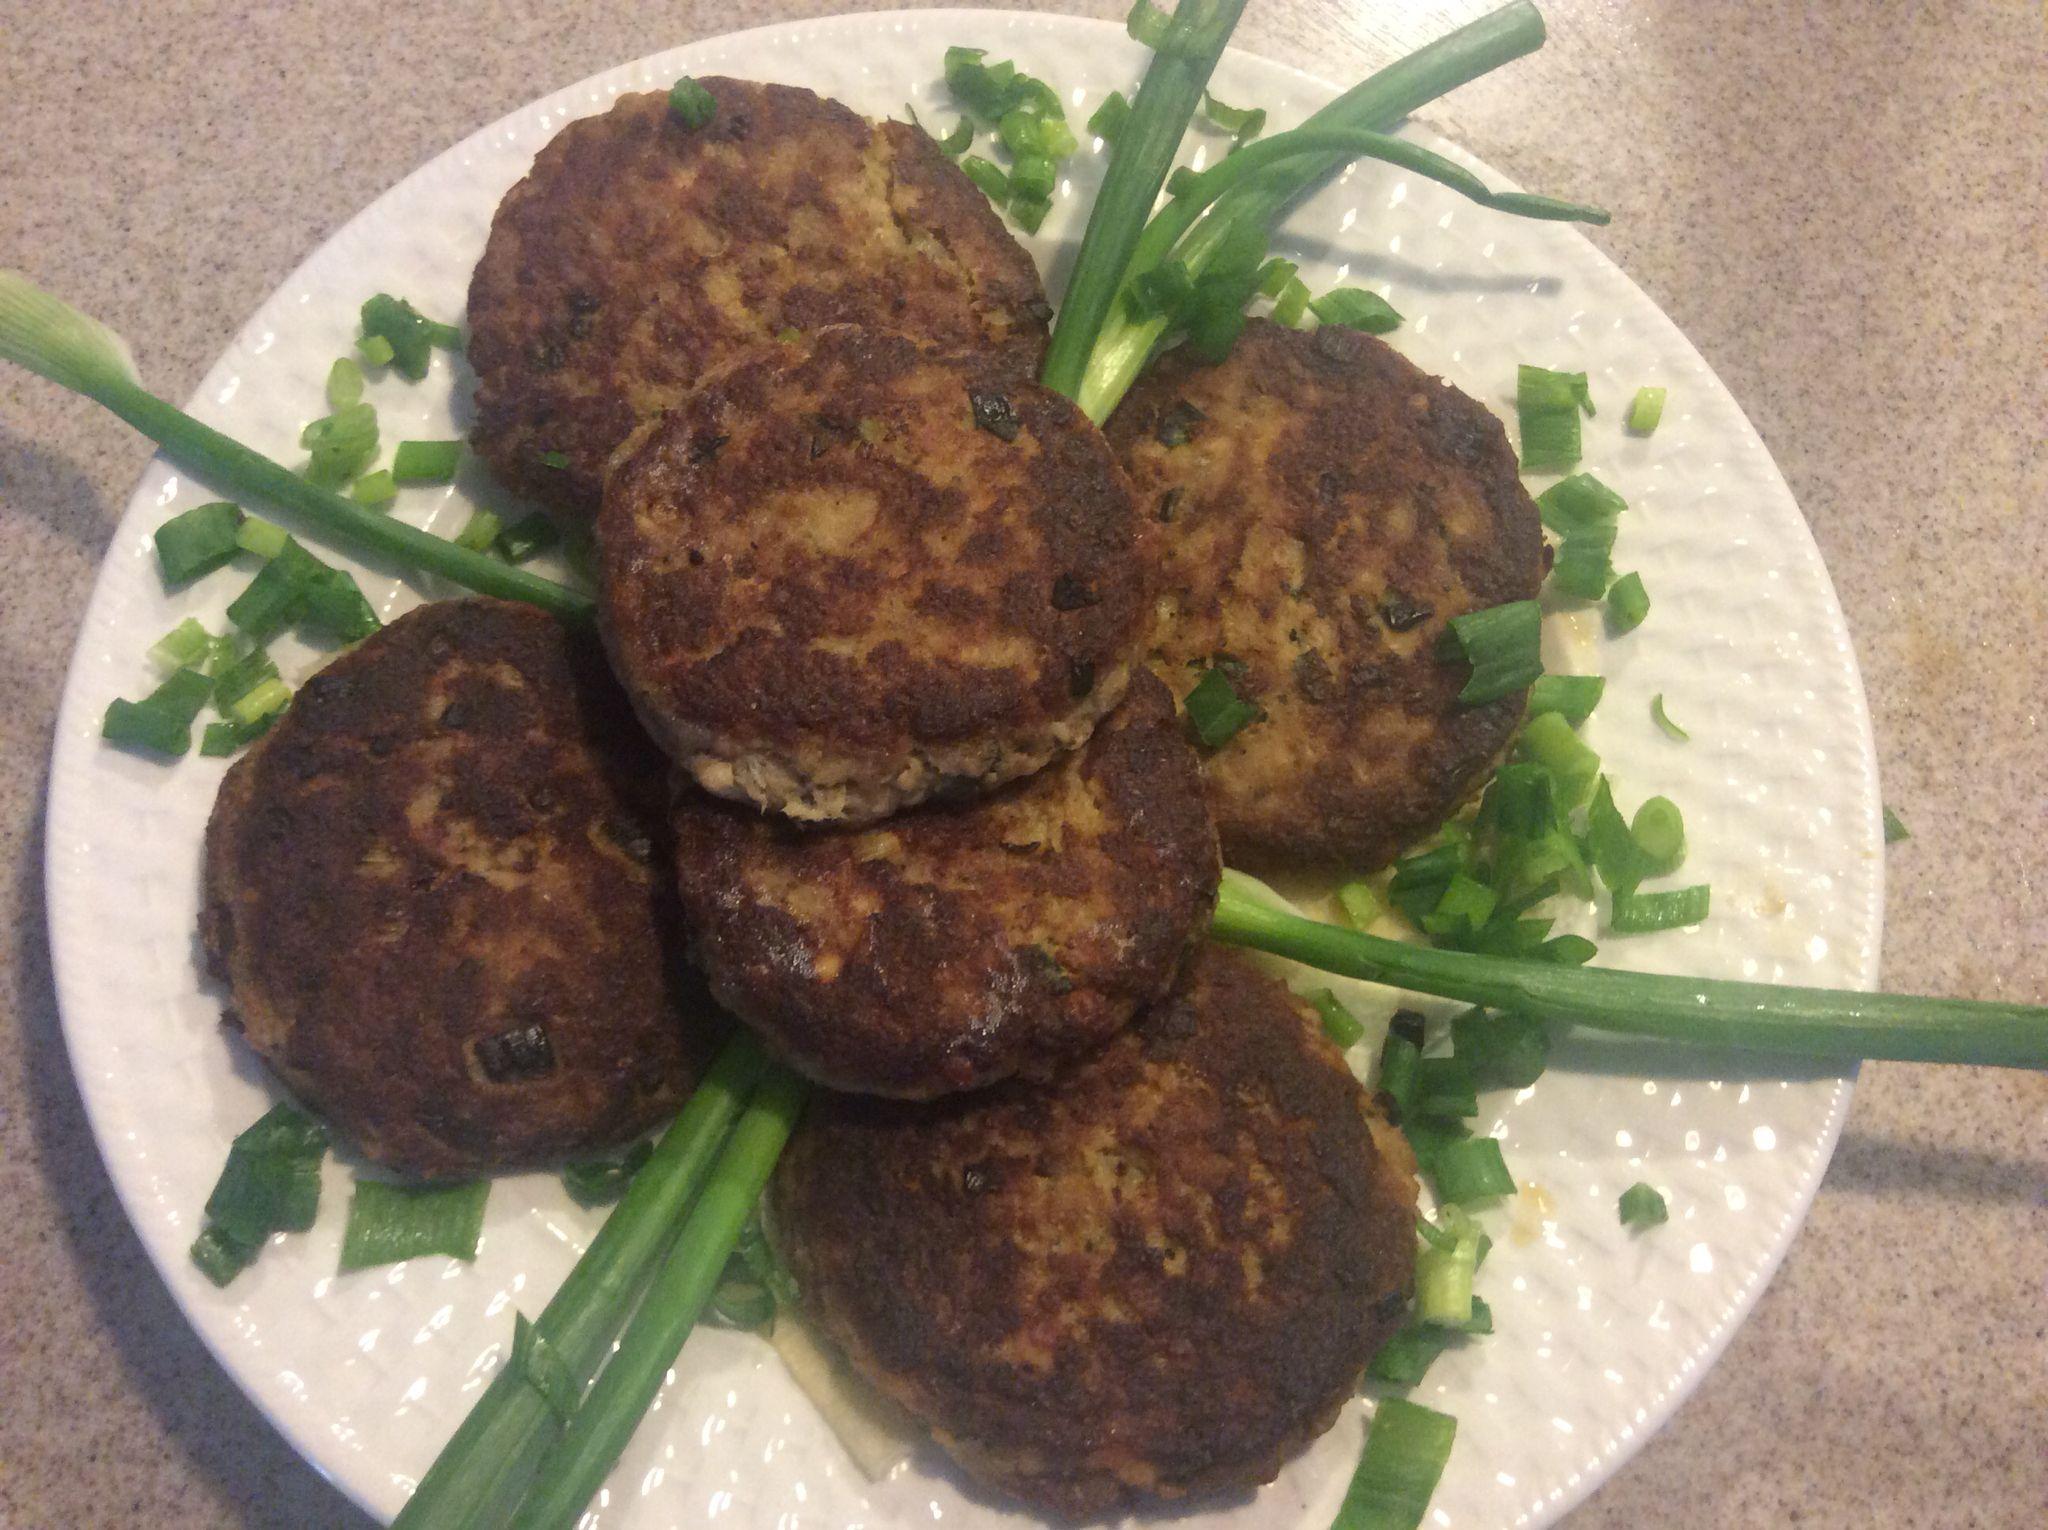 ChefJD's Salmon Croquets